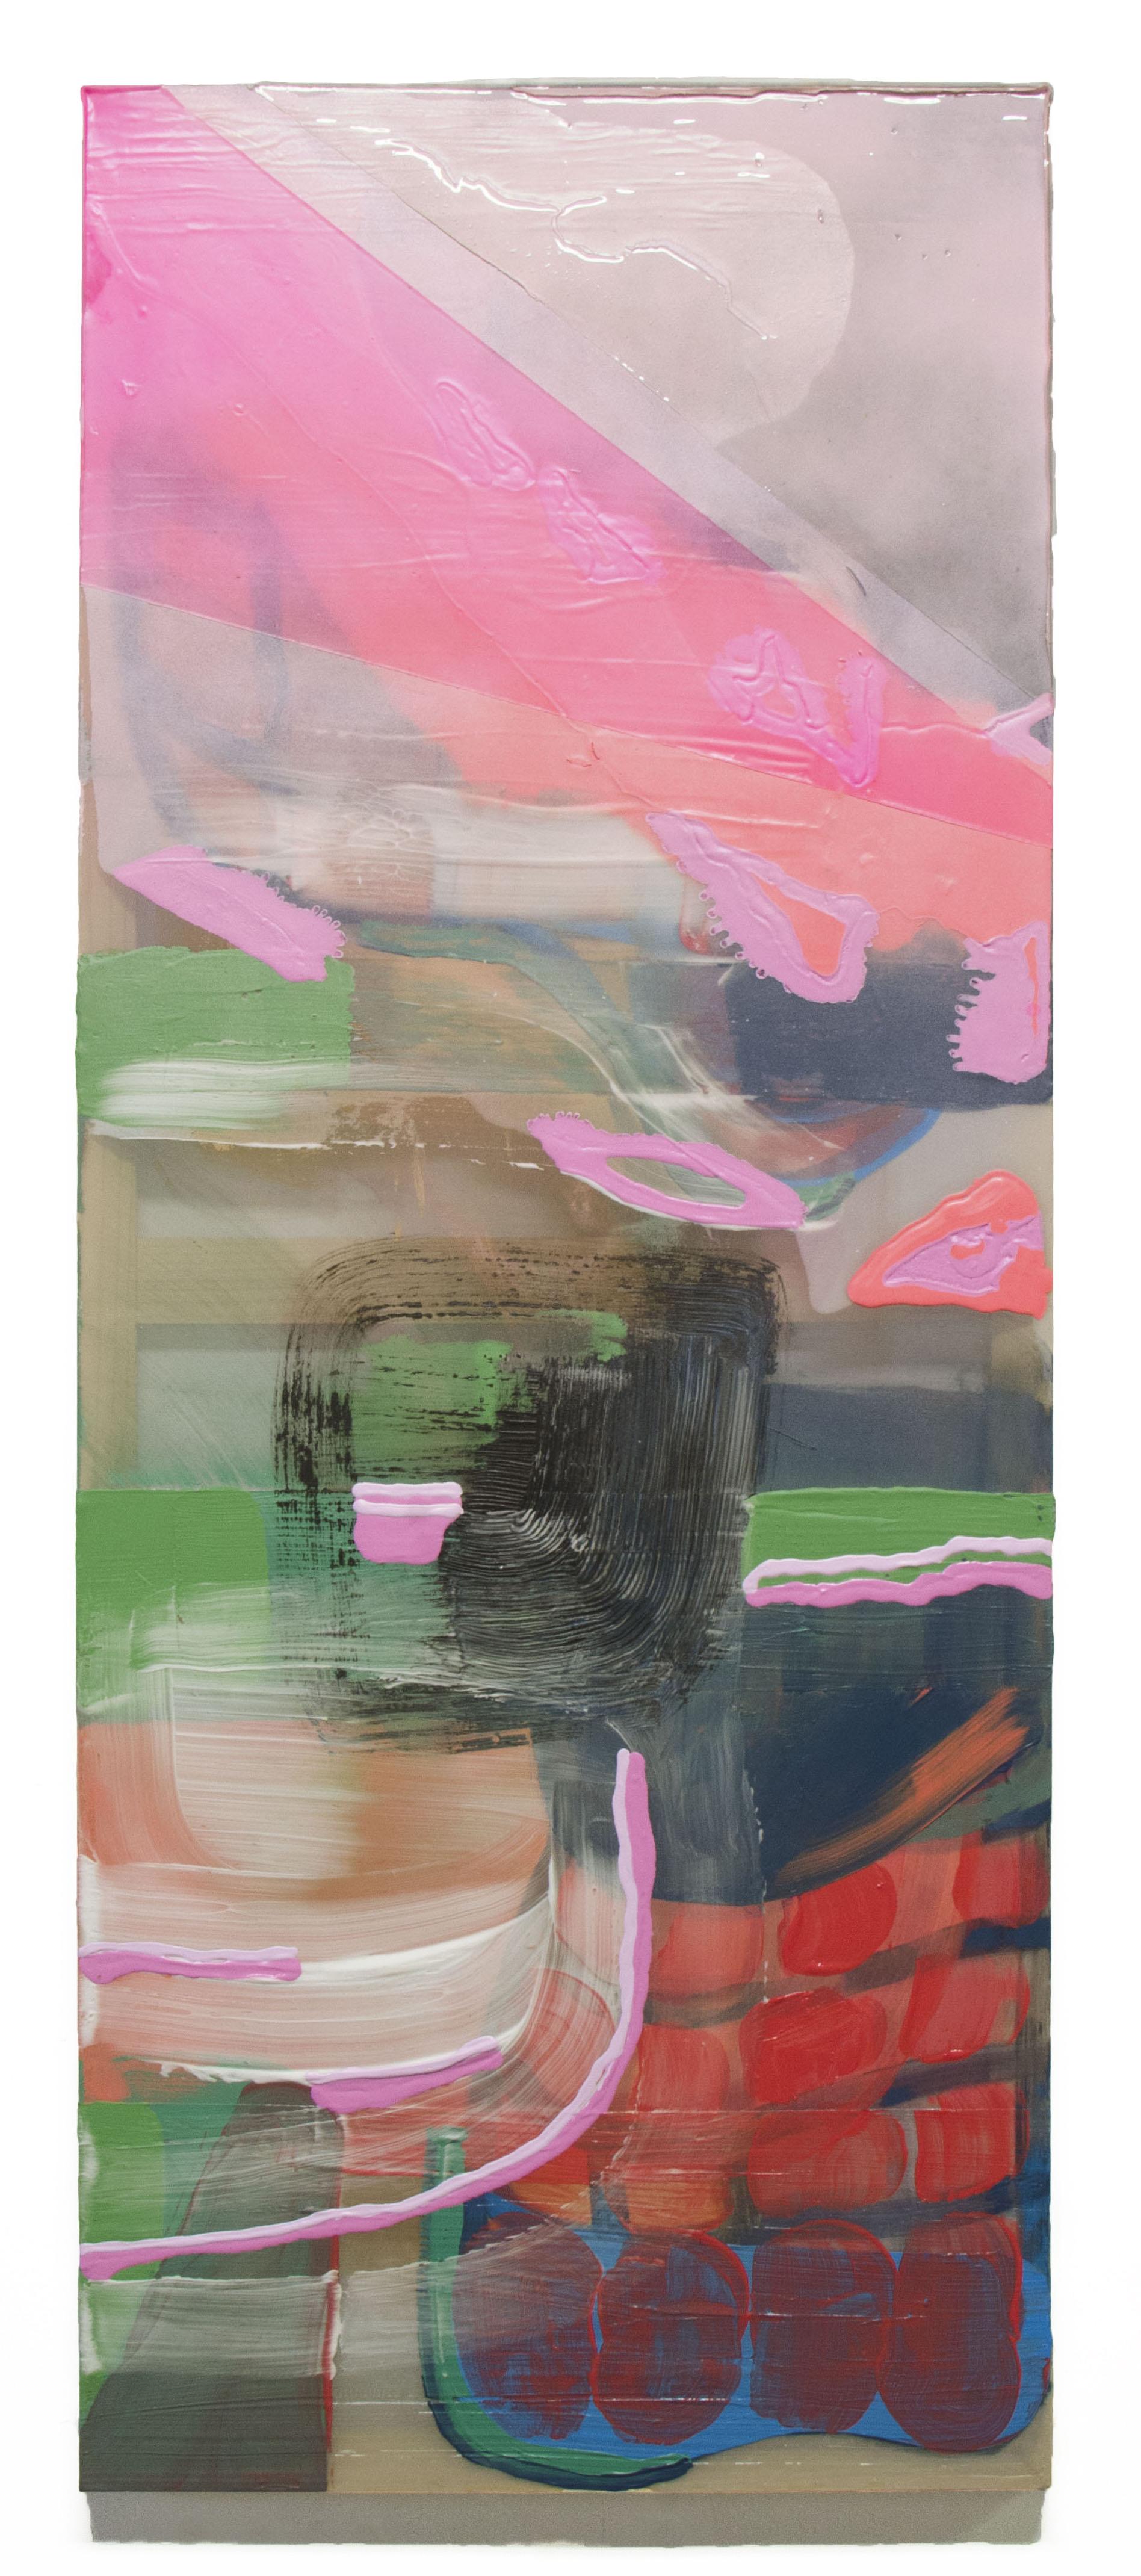 "View From - Elise Thompson40.5"" x 16"" acrylic on chiffon $1200"